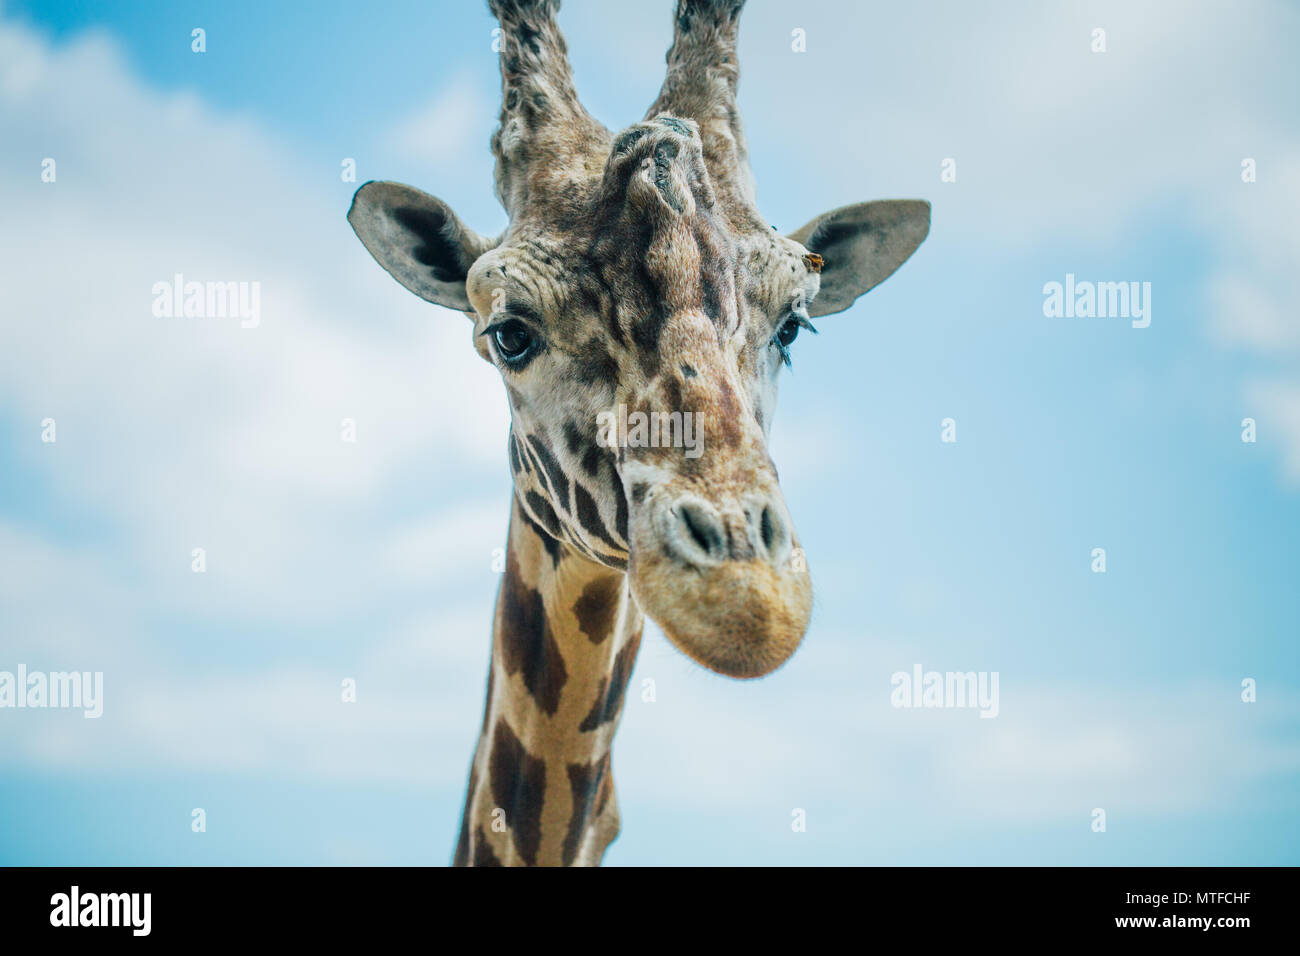 Giraffe in Fasano apulia safari zoo Italy Stock Photo